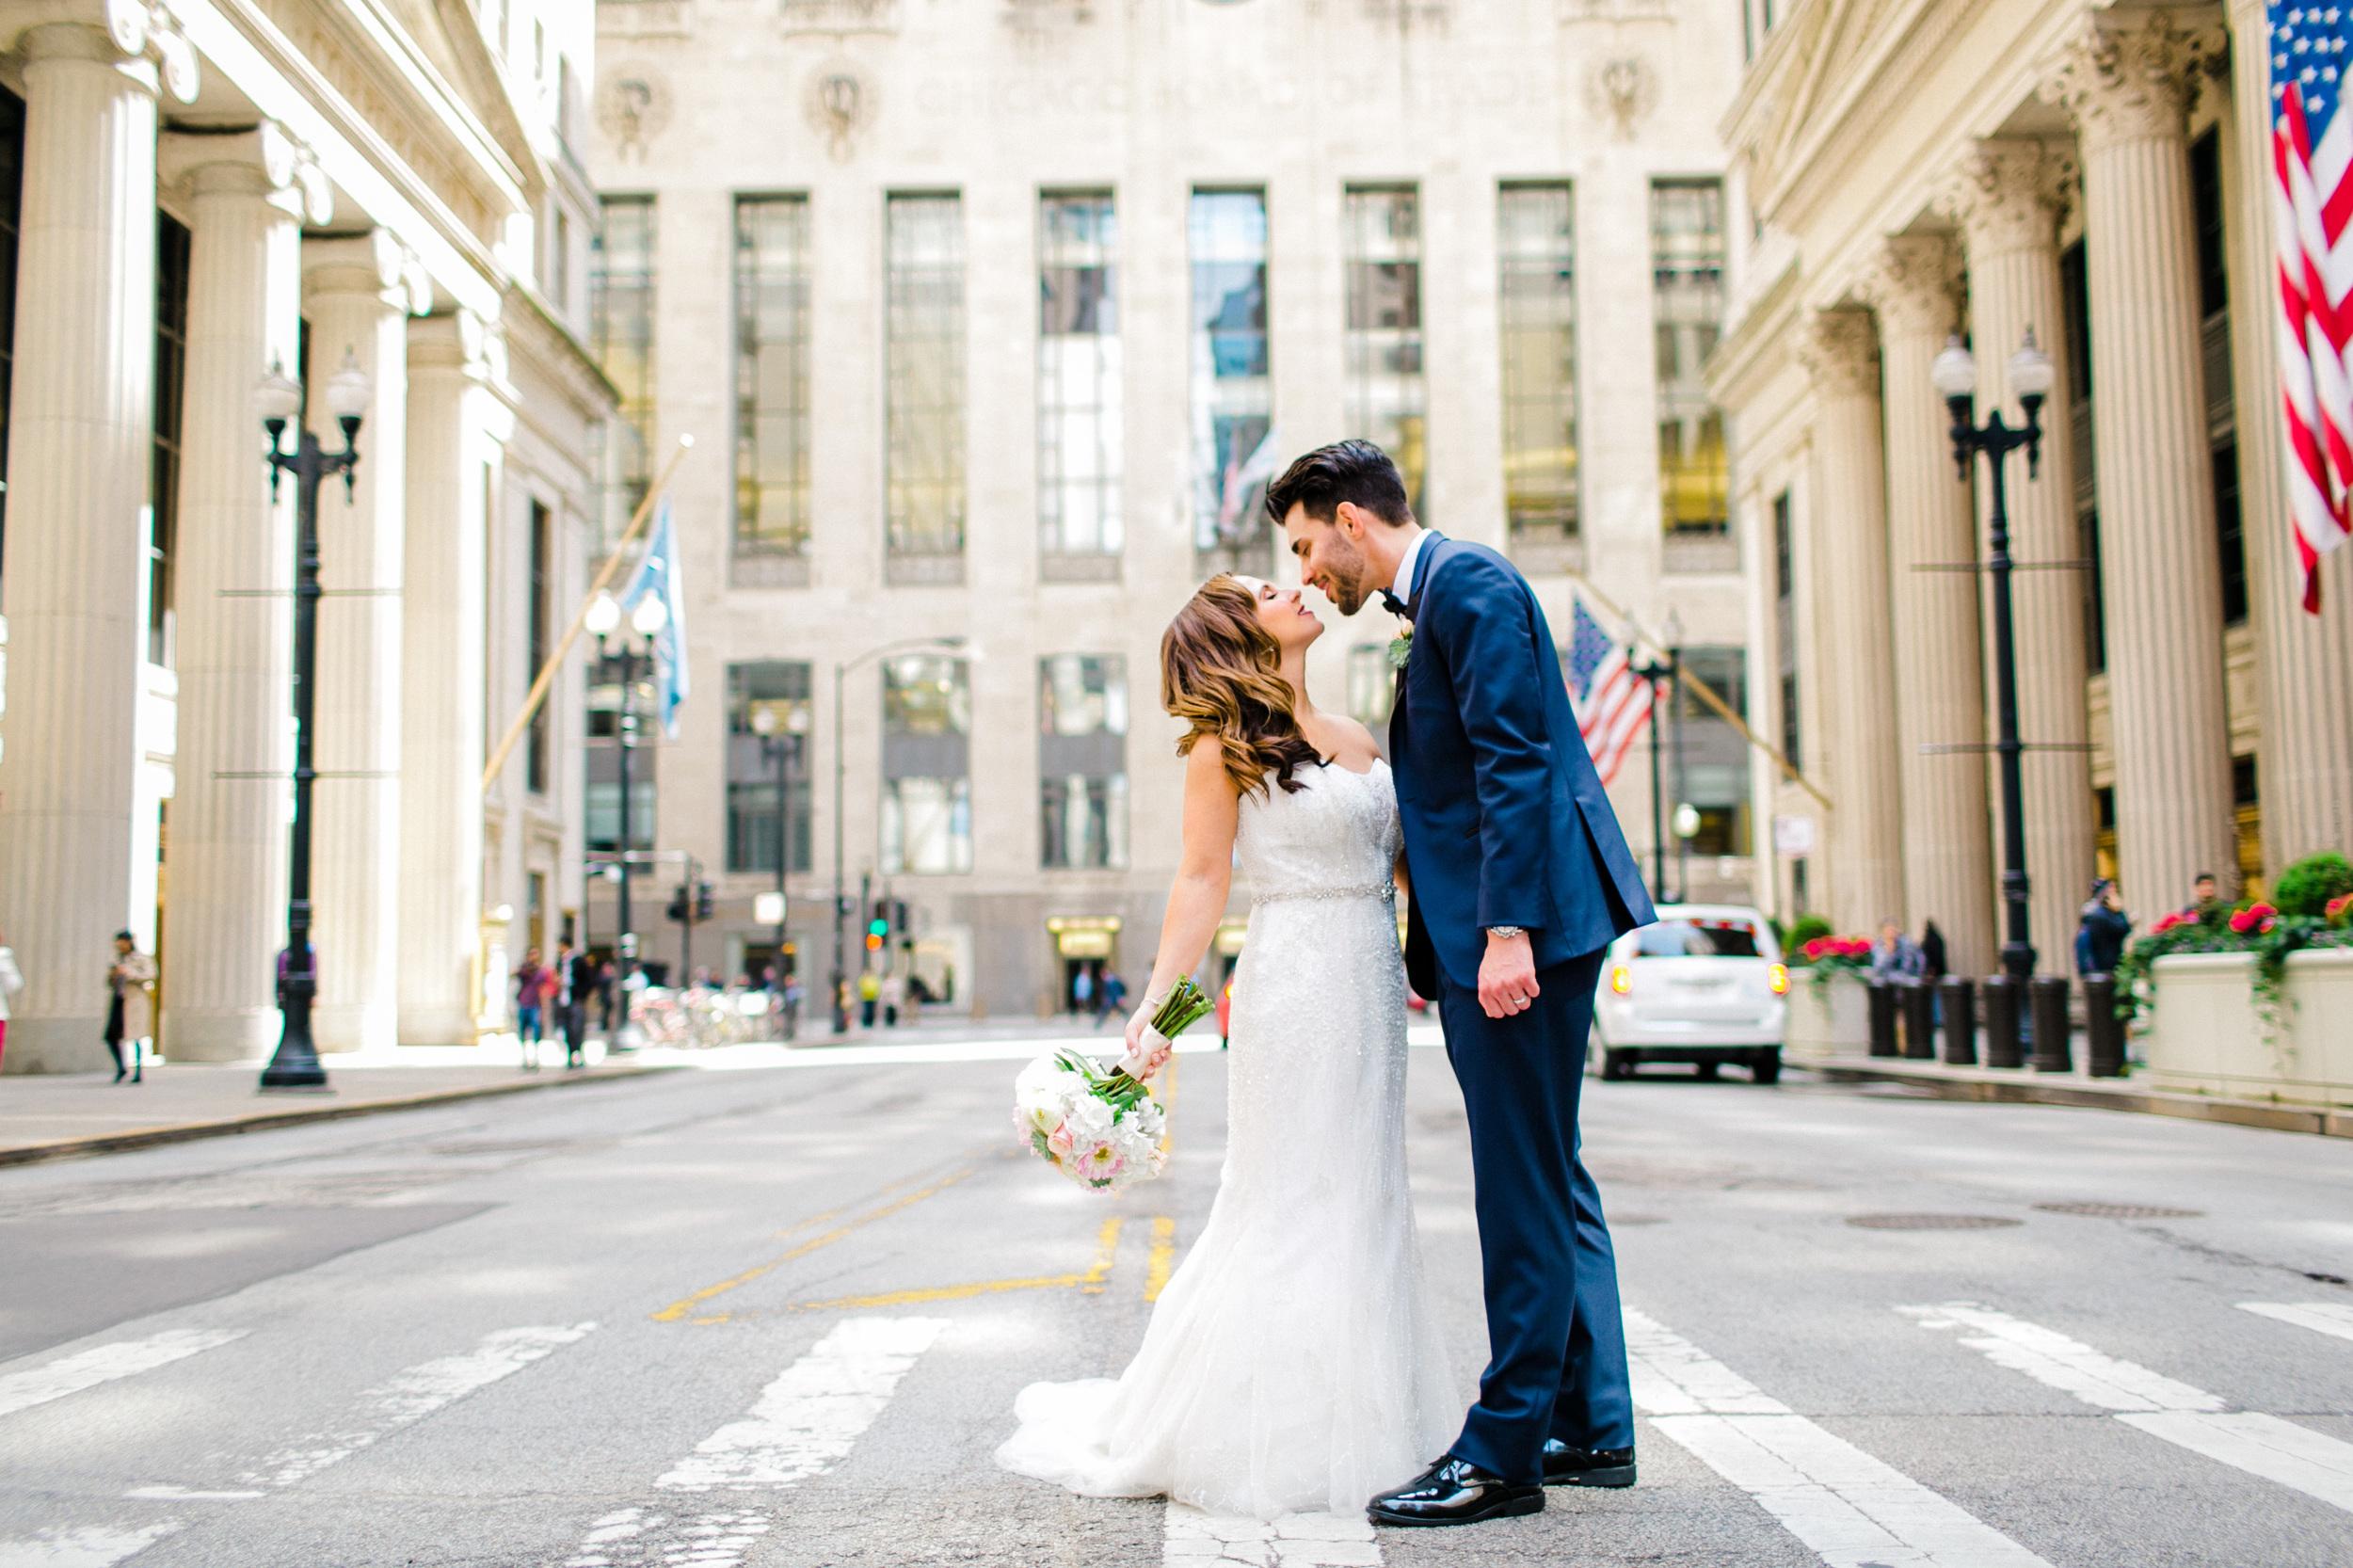 mayden_photography_weddings-57.jpg